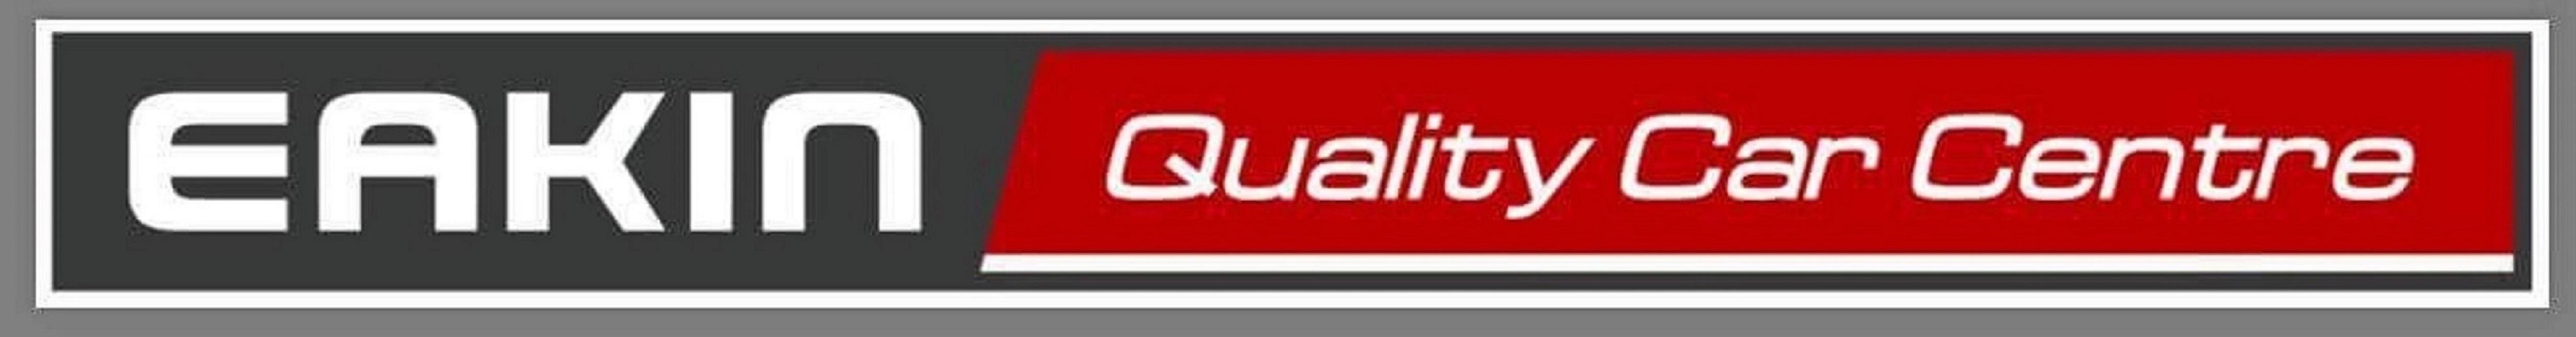 Eakin Quality Car Centre